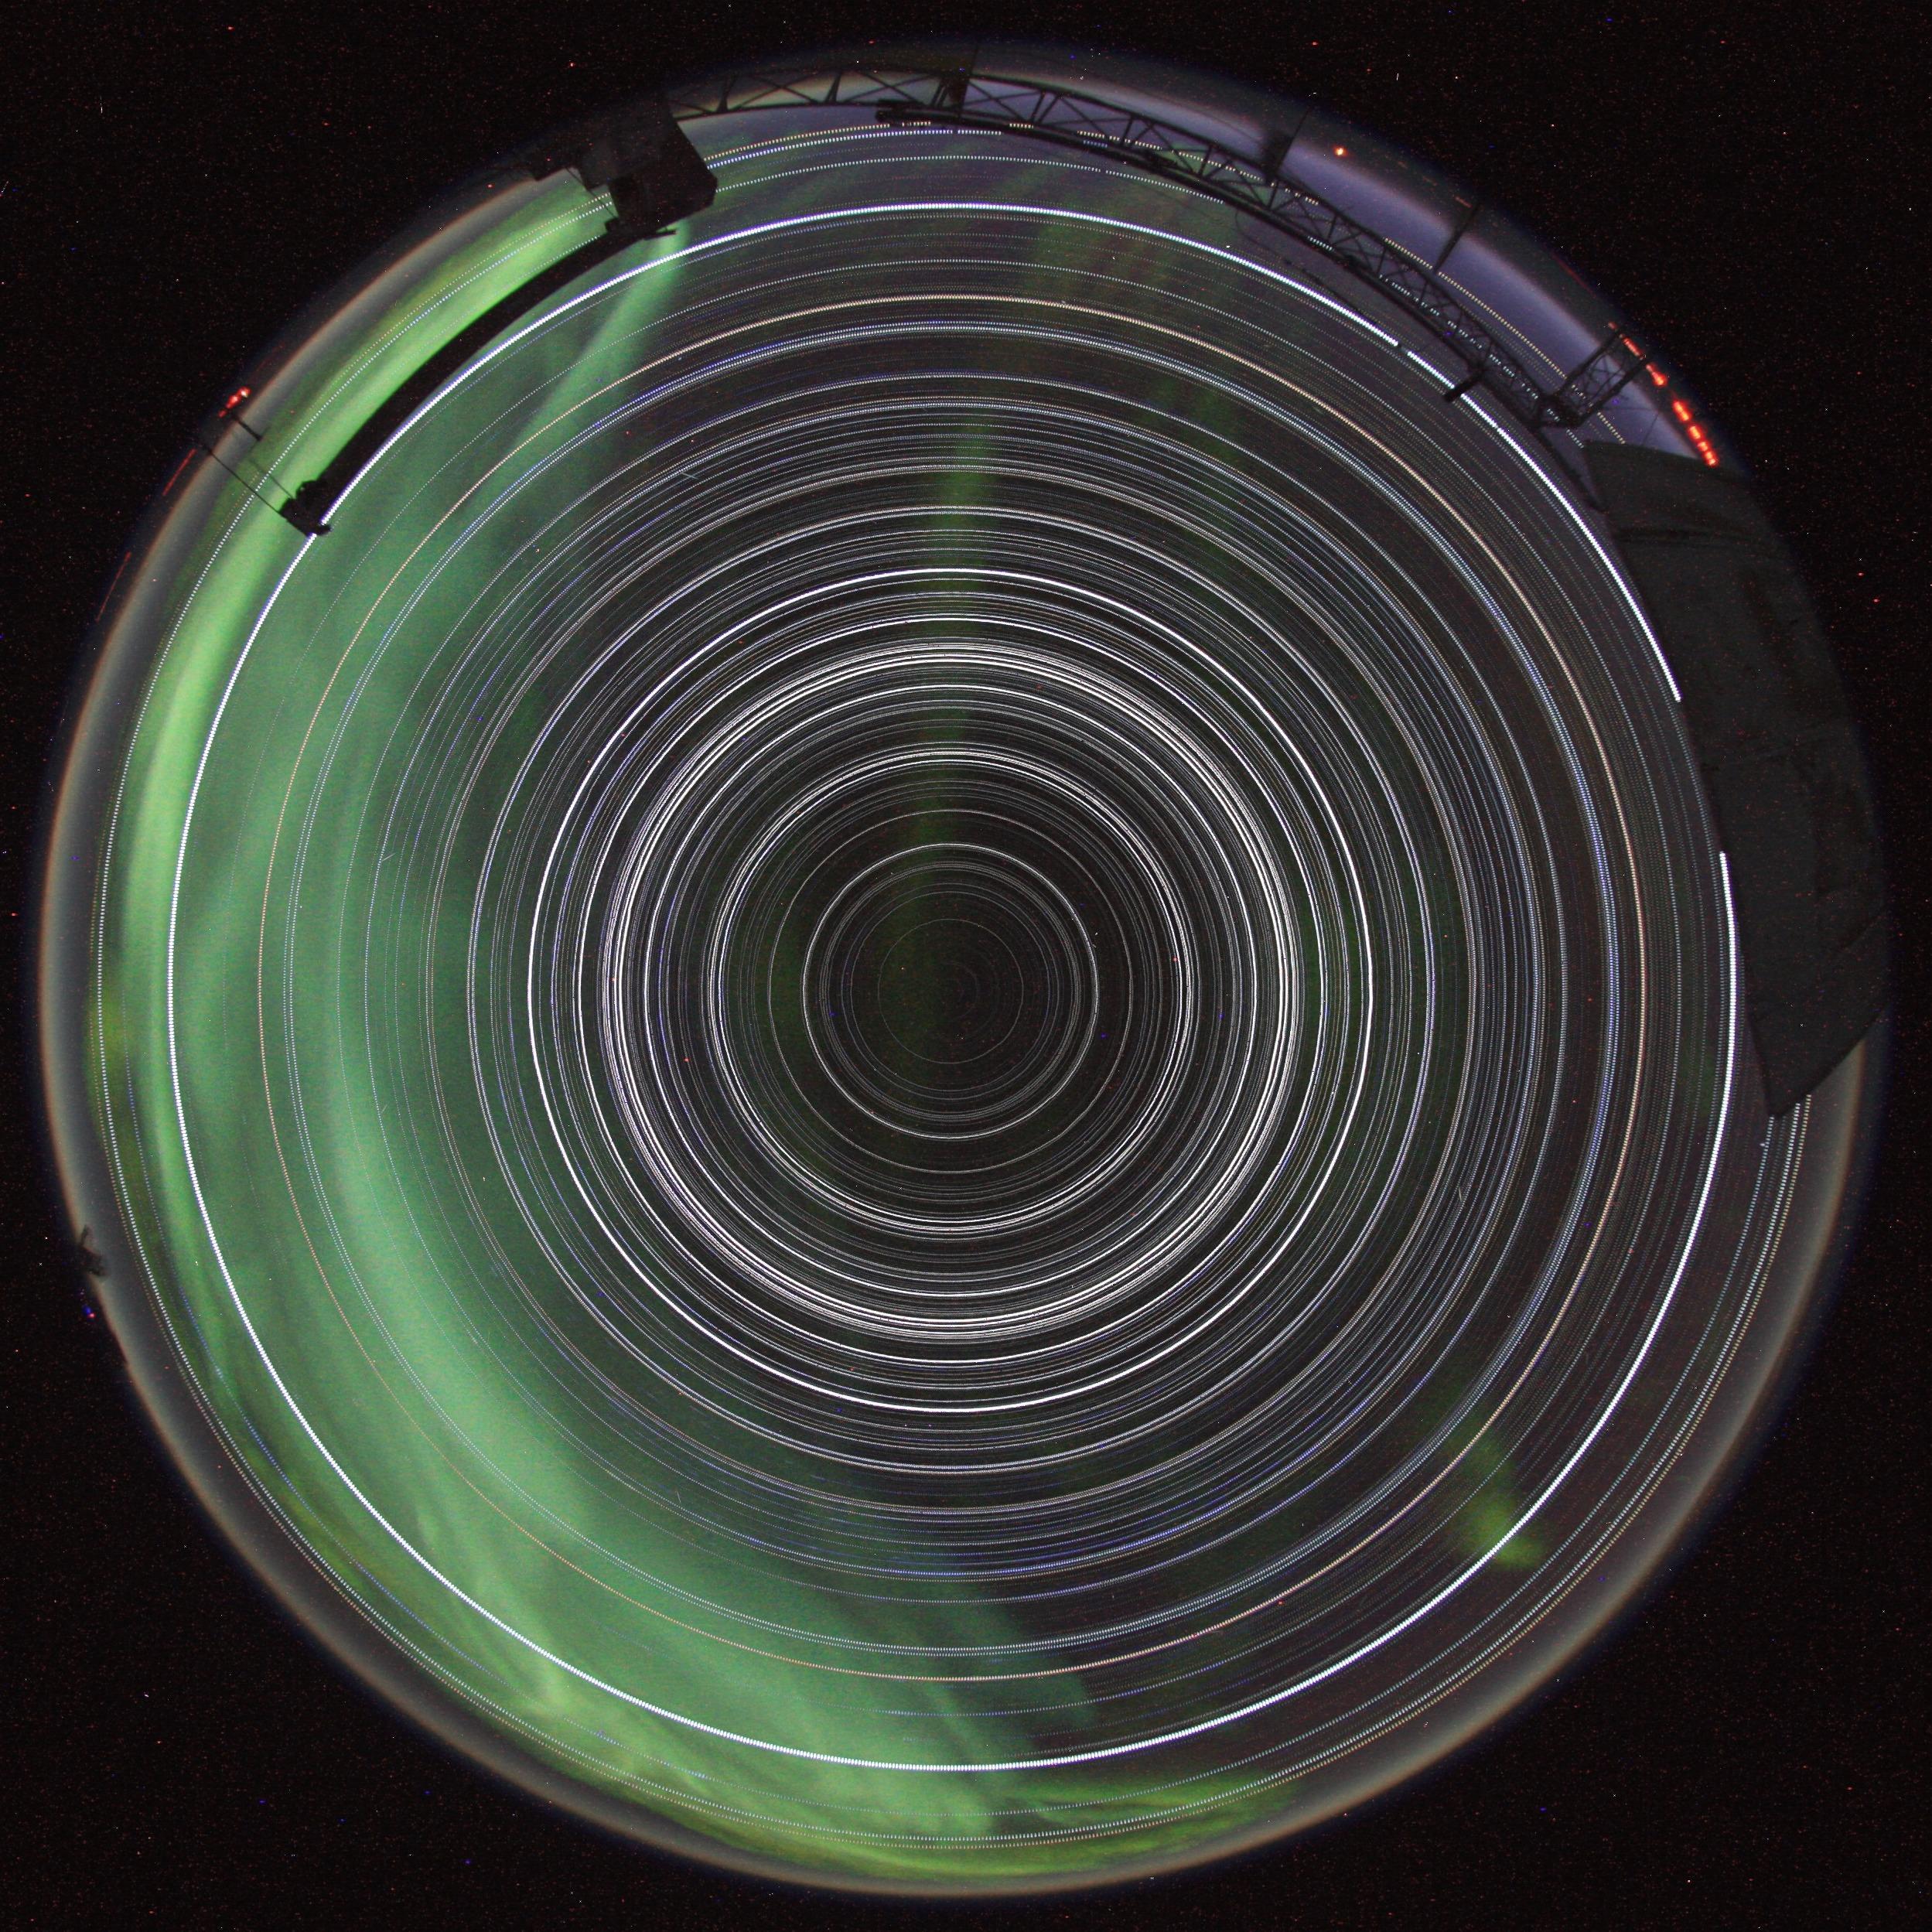 South Pole Star Trails